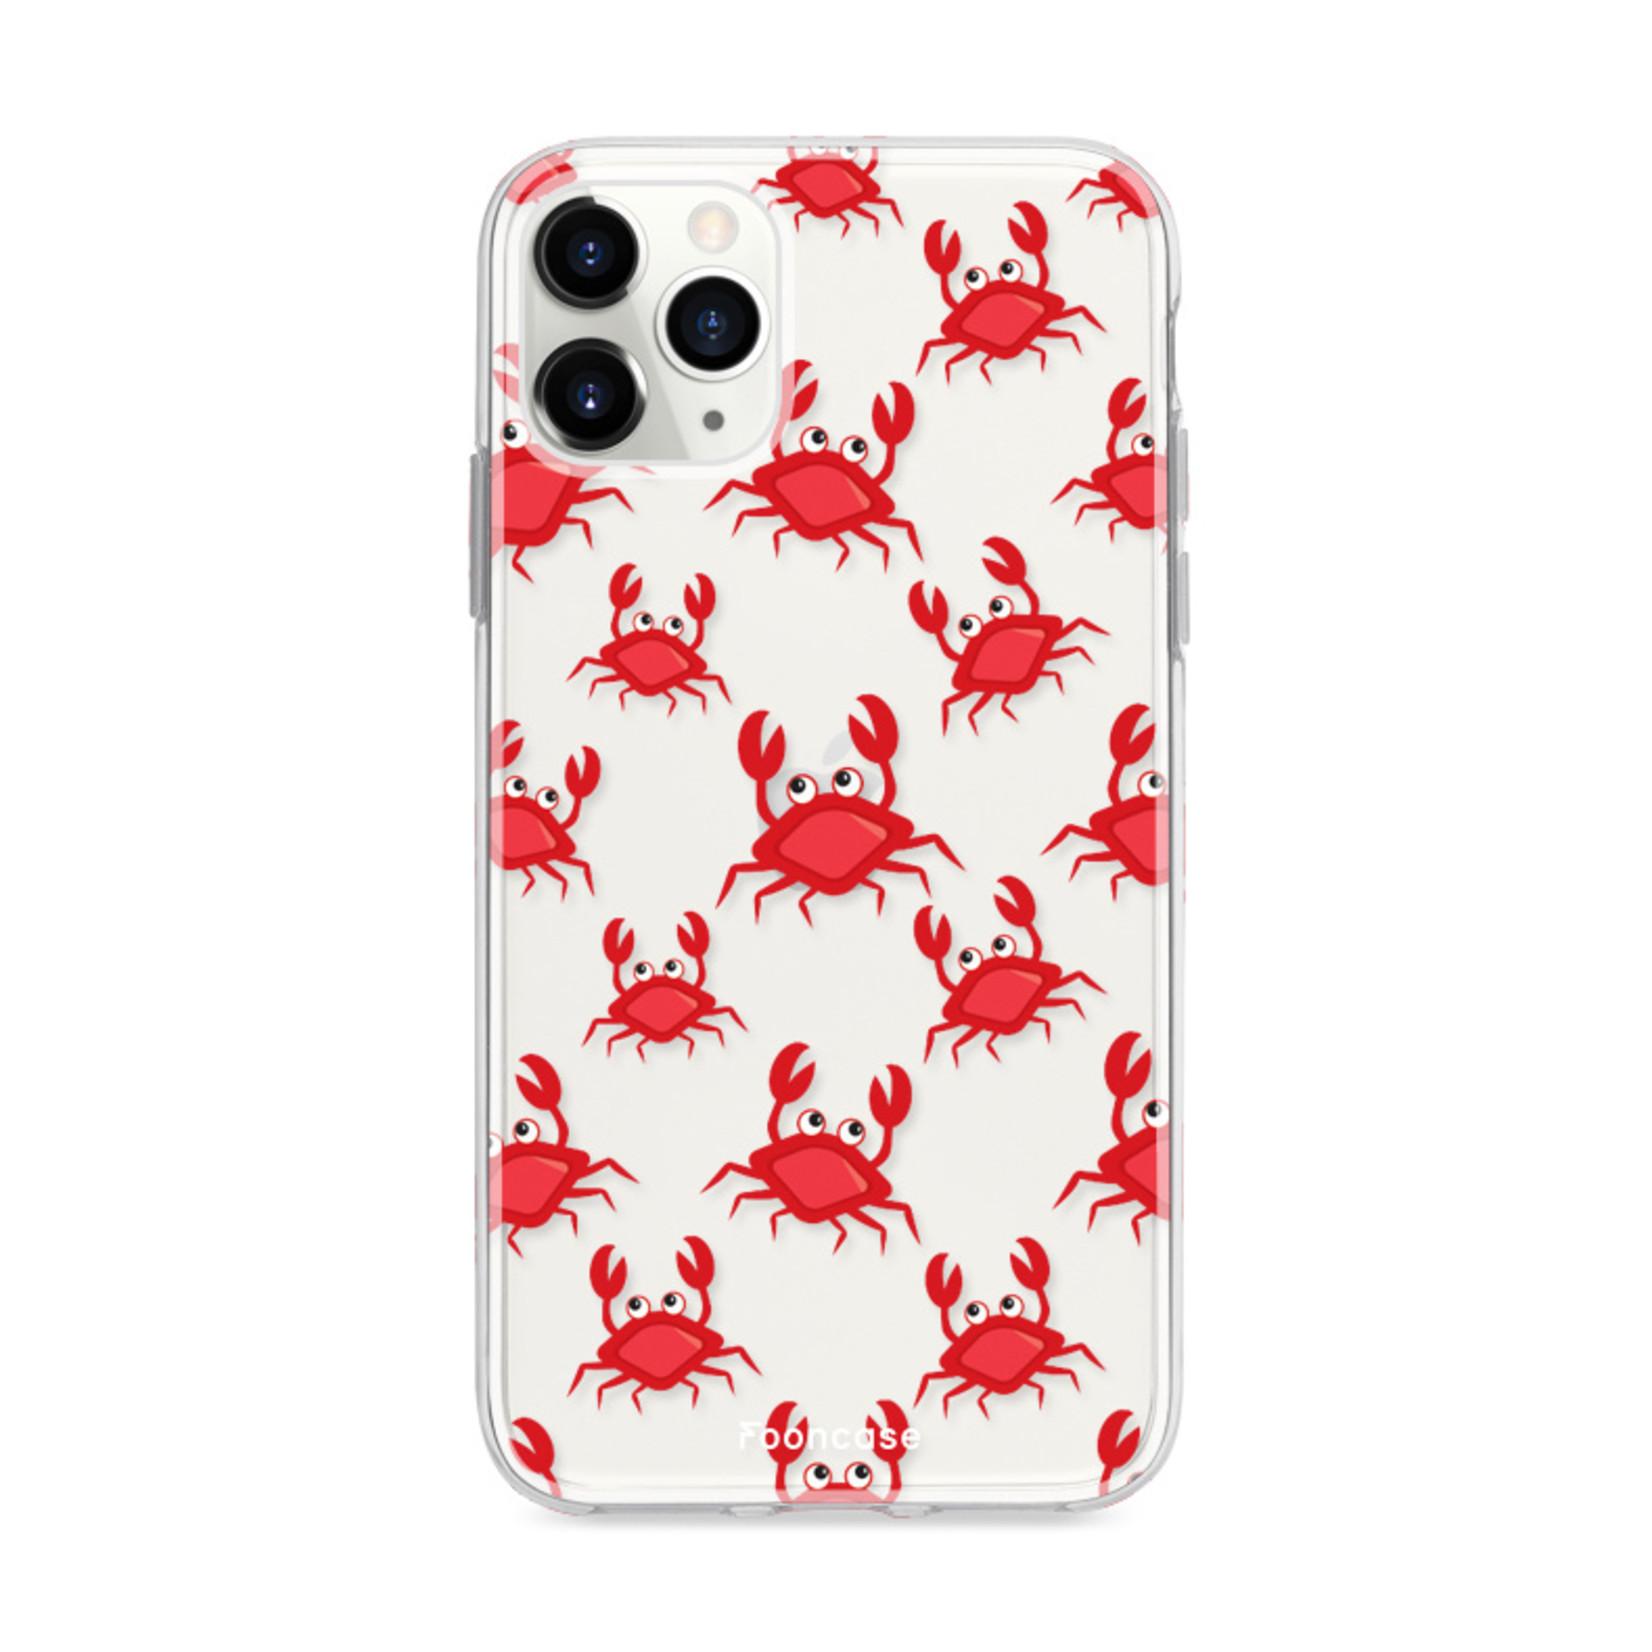 FOONCASE IPhone 11 Pro Handyhülle - Krabben